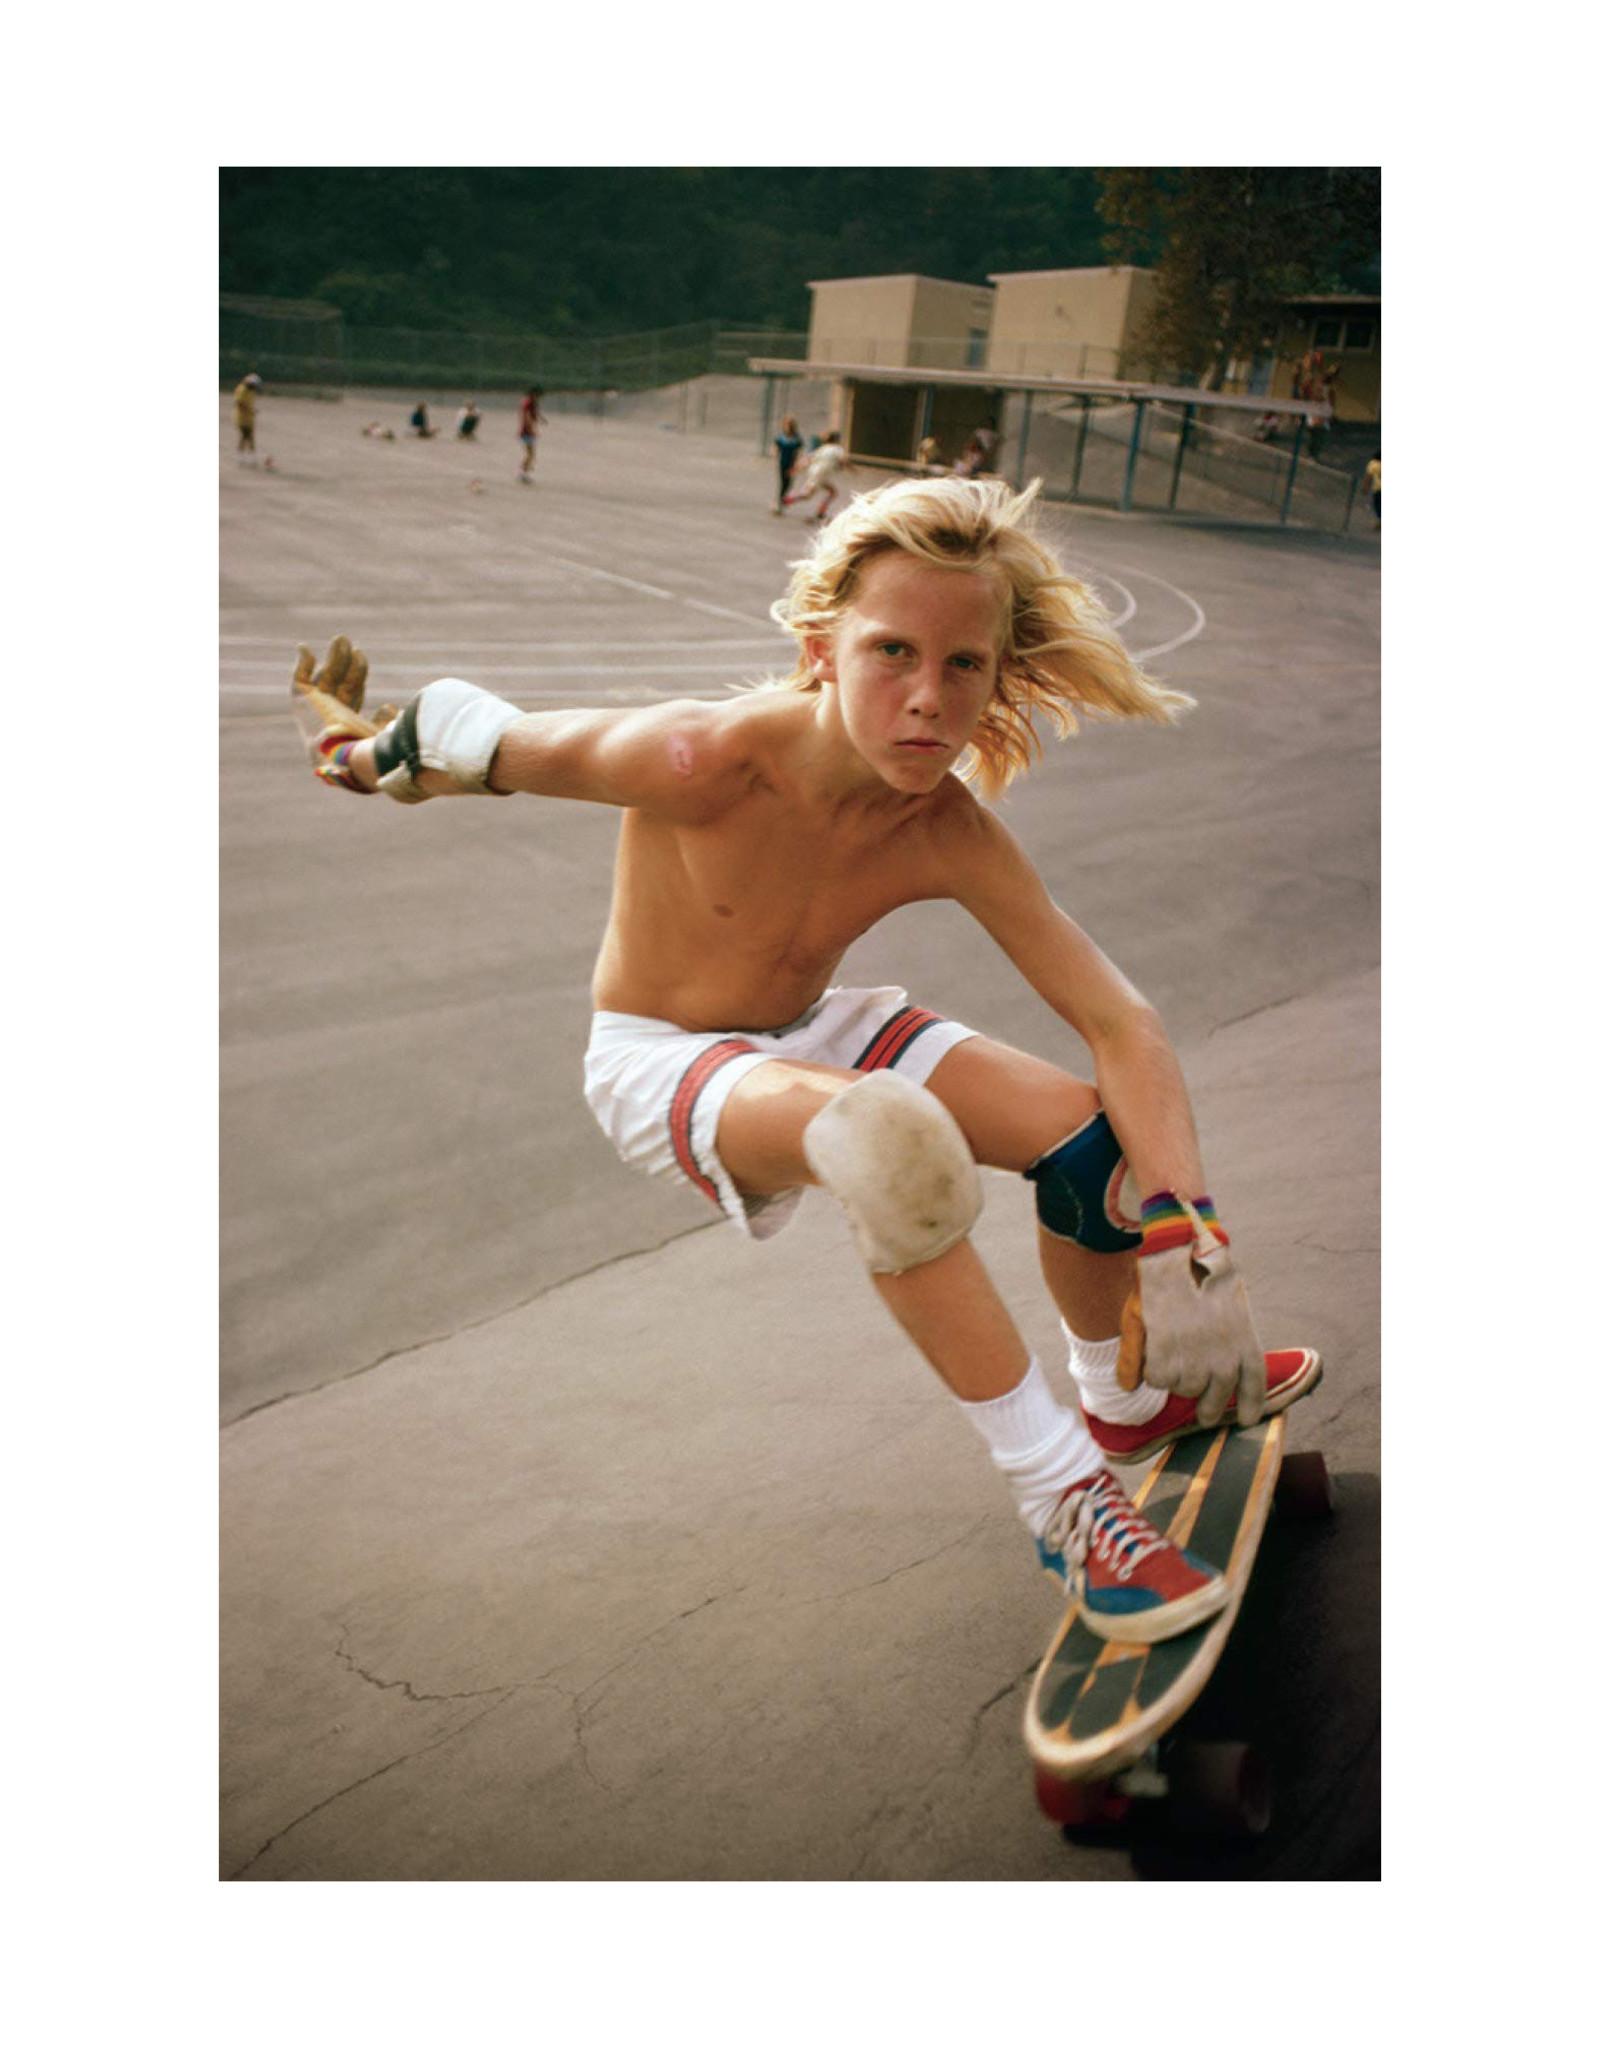 Sun. Skate. Seventies. Postcards